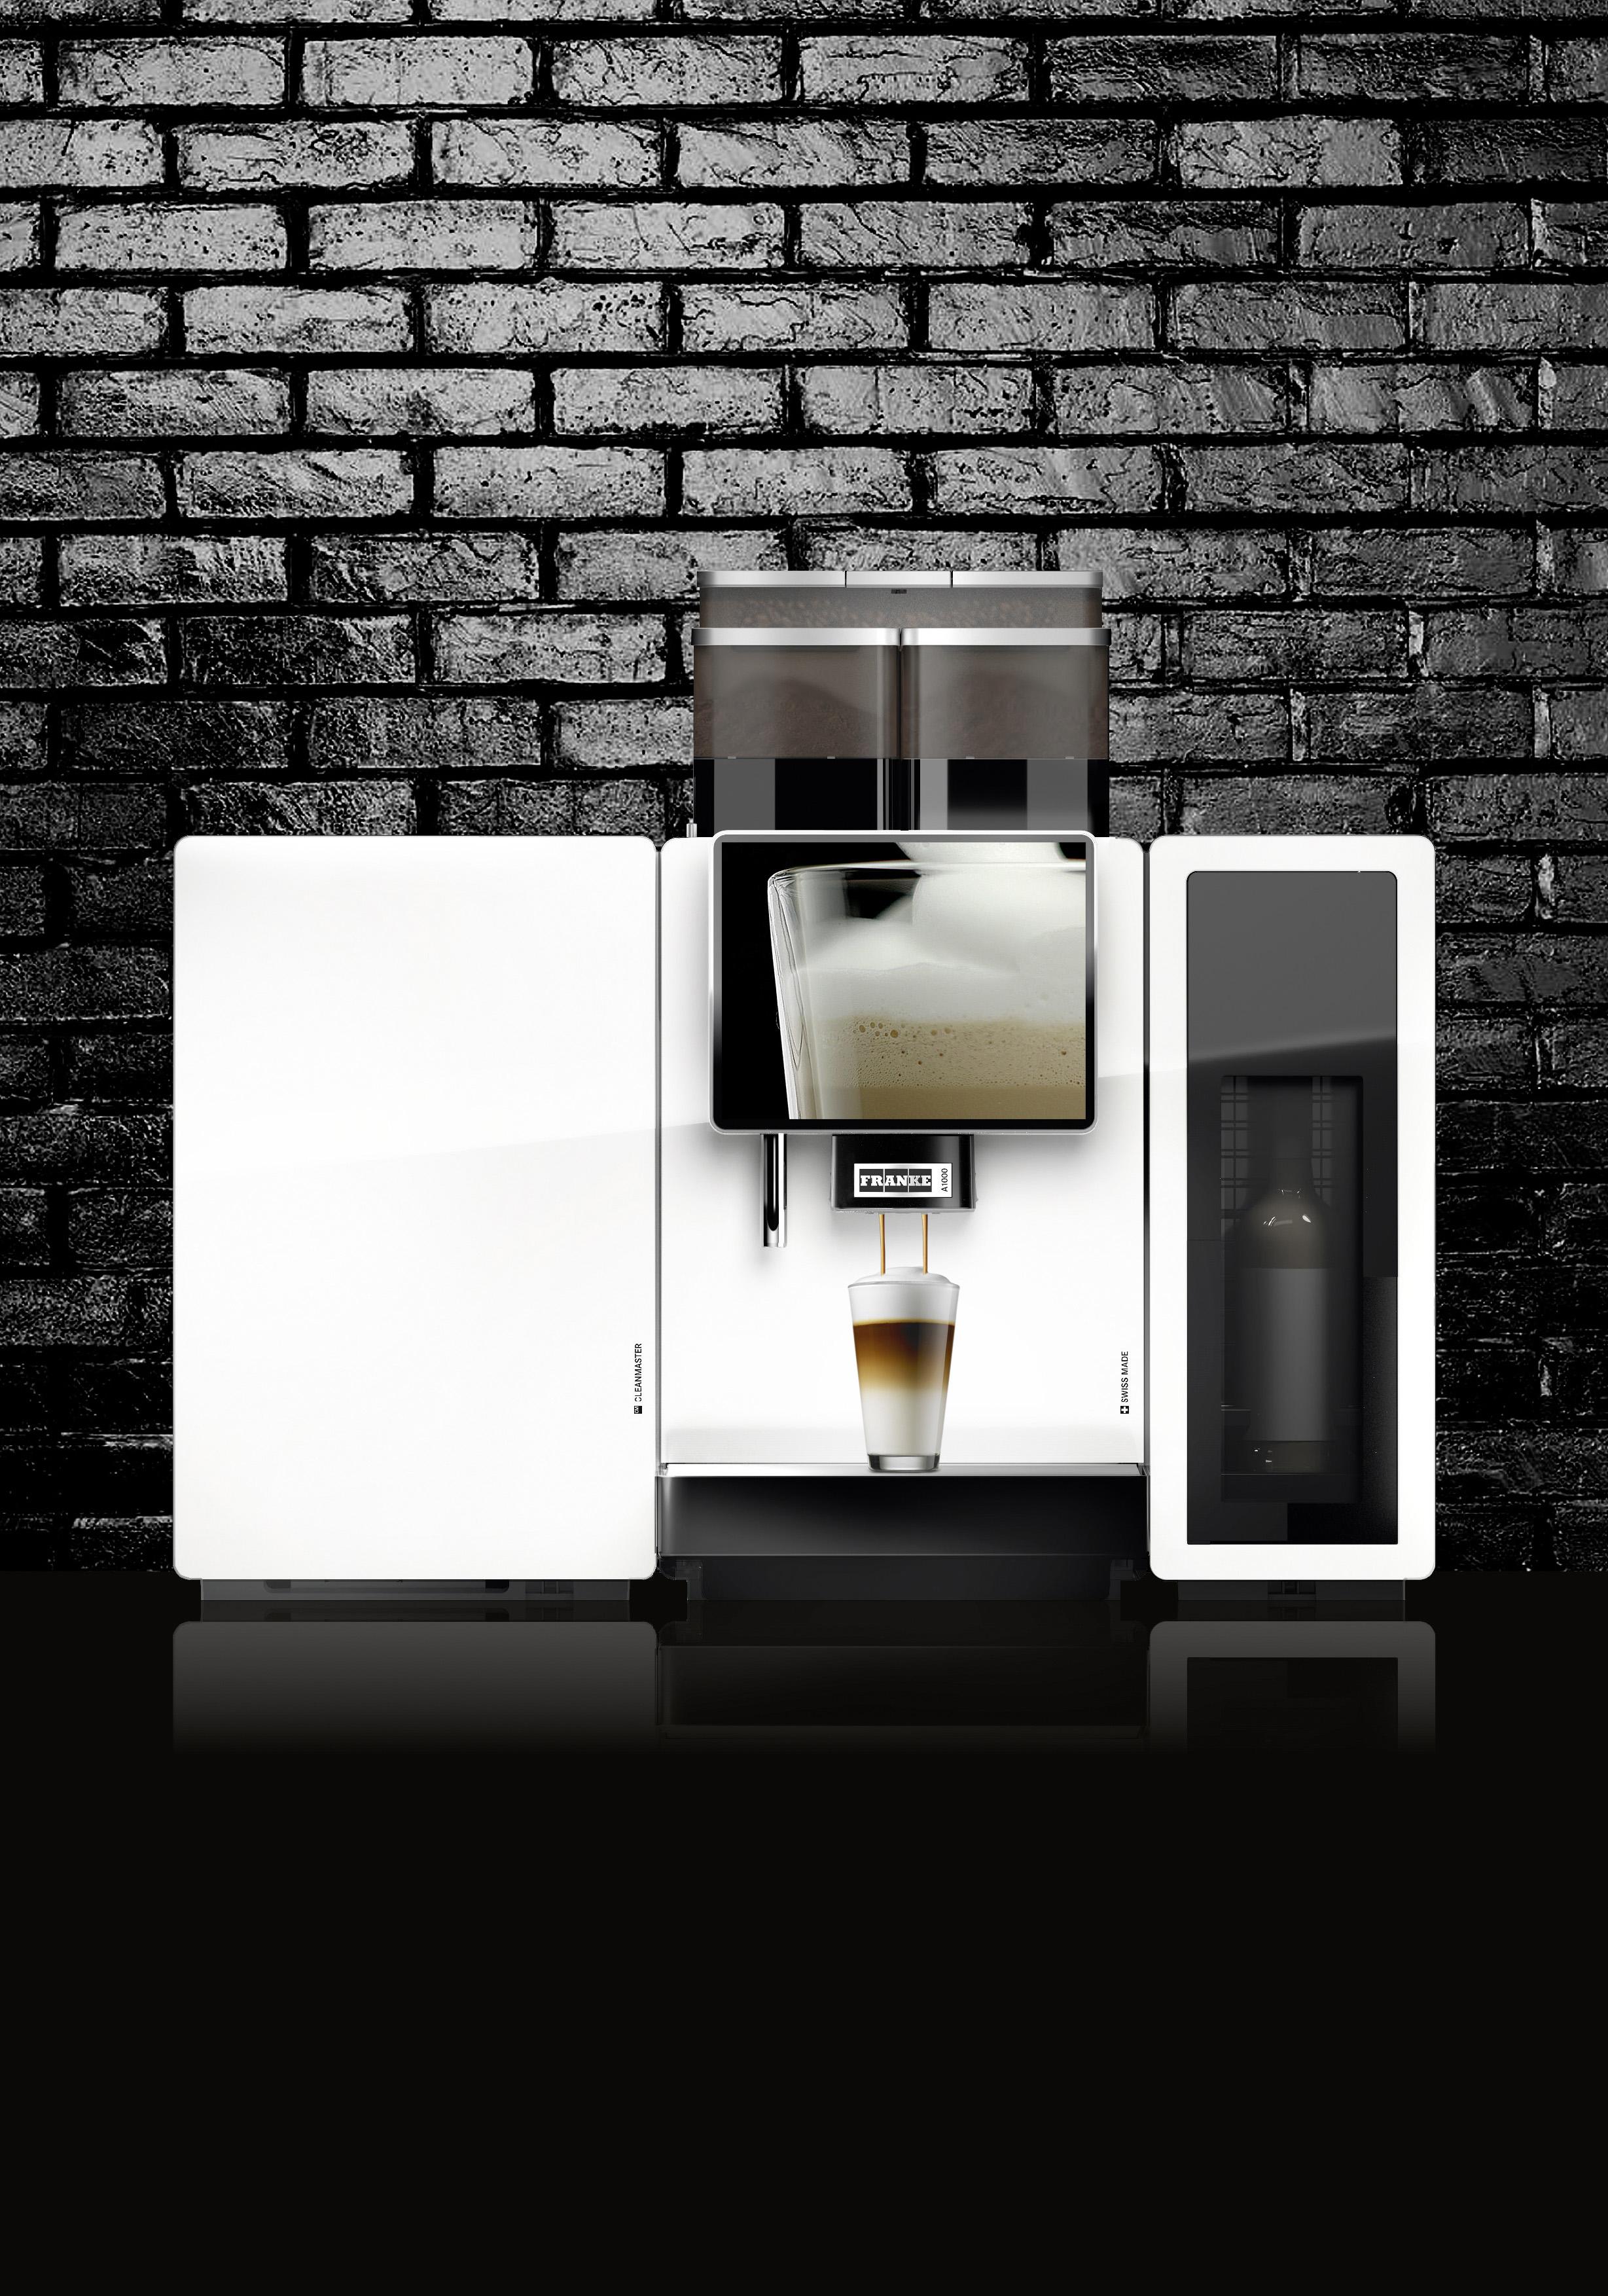 die neue a1000 die neue genuss dimension medienmitteilung franke coffee systems. Black Bedroom Furniture Sets. Home Design Ideas